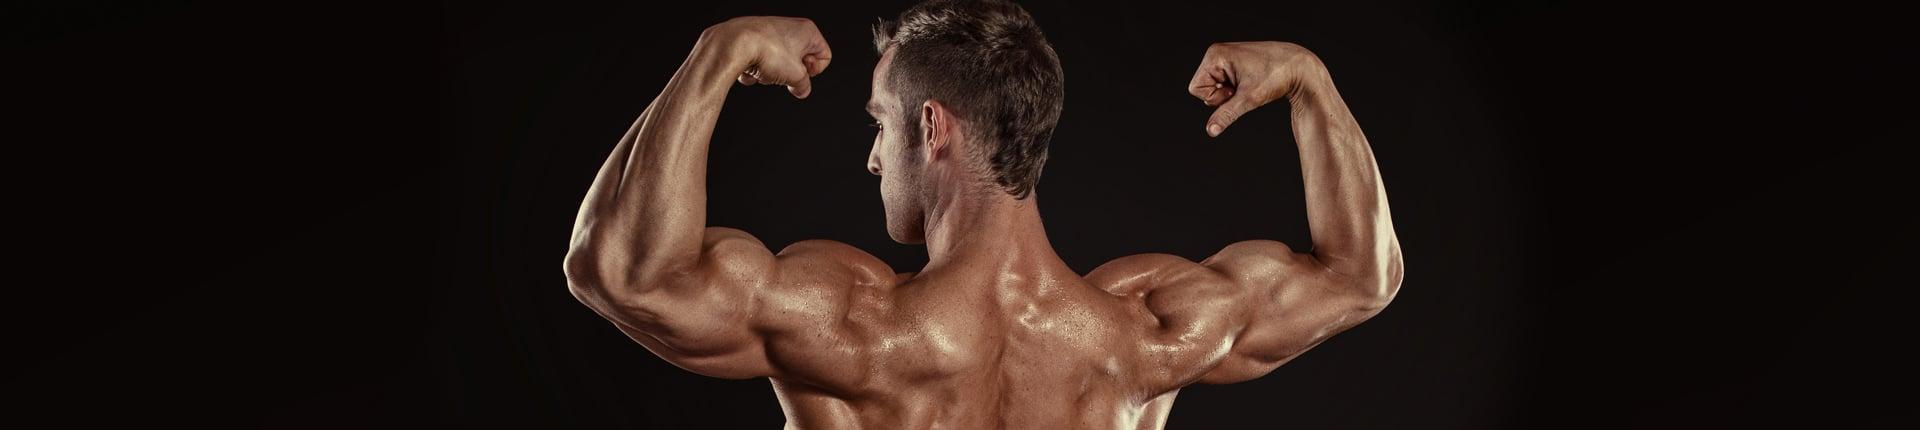 Siła, moc i masa mięśni: METODA RAMPY